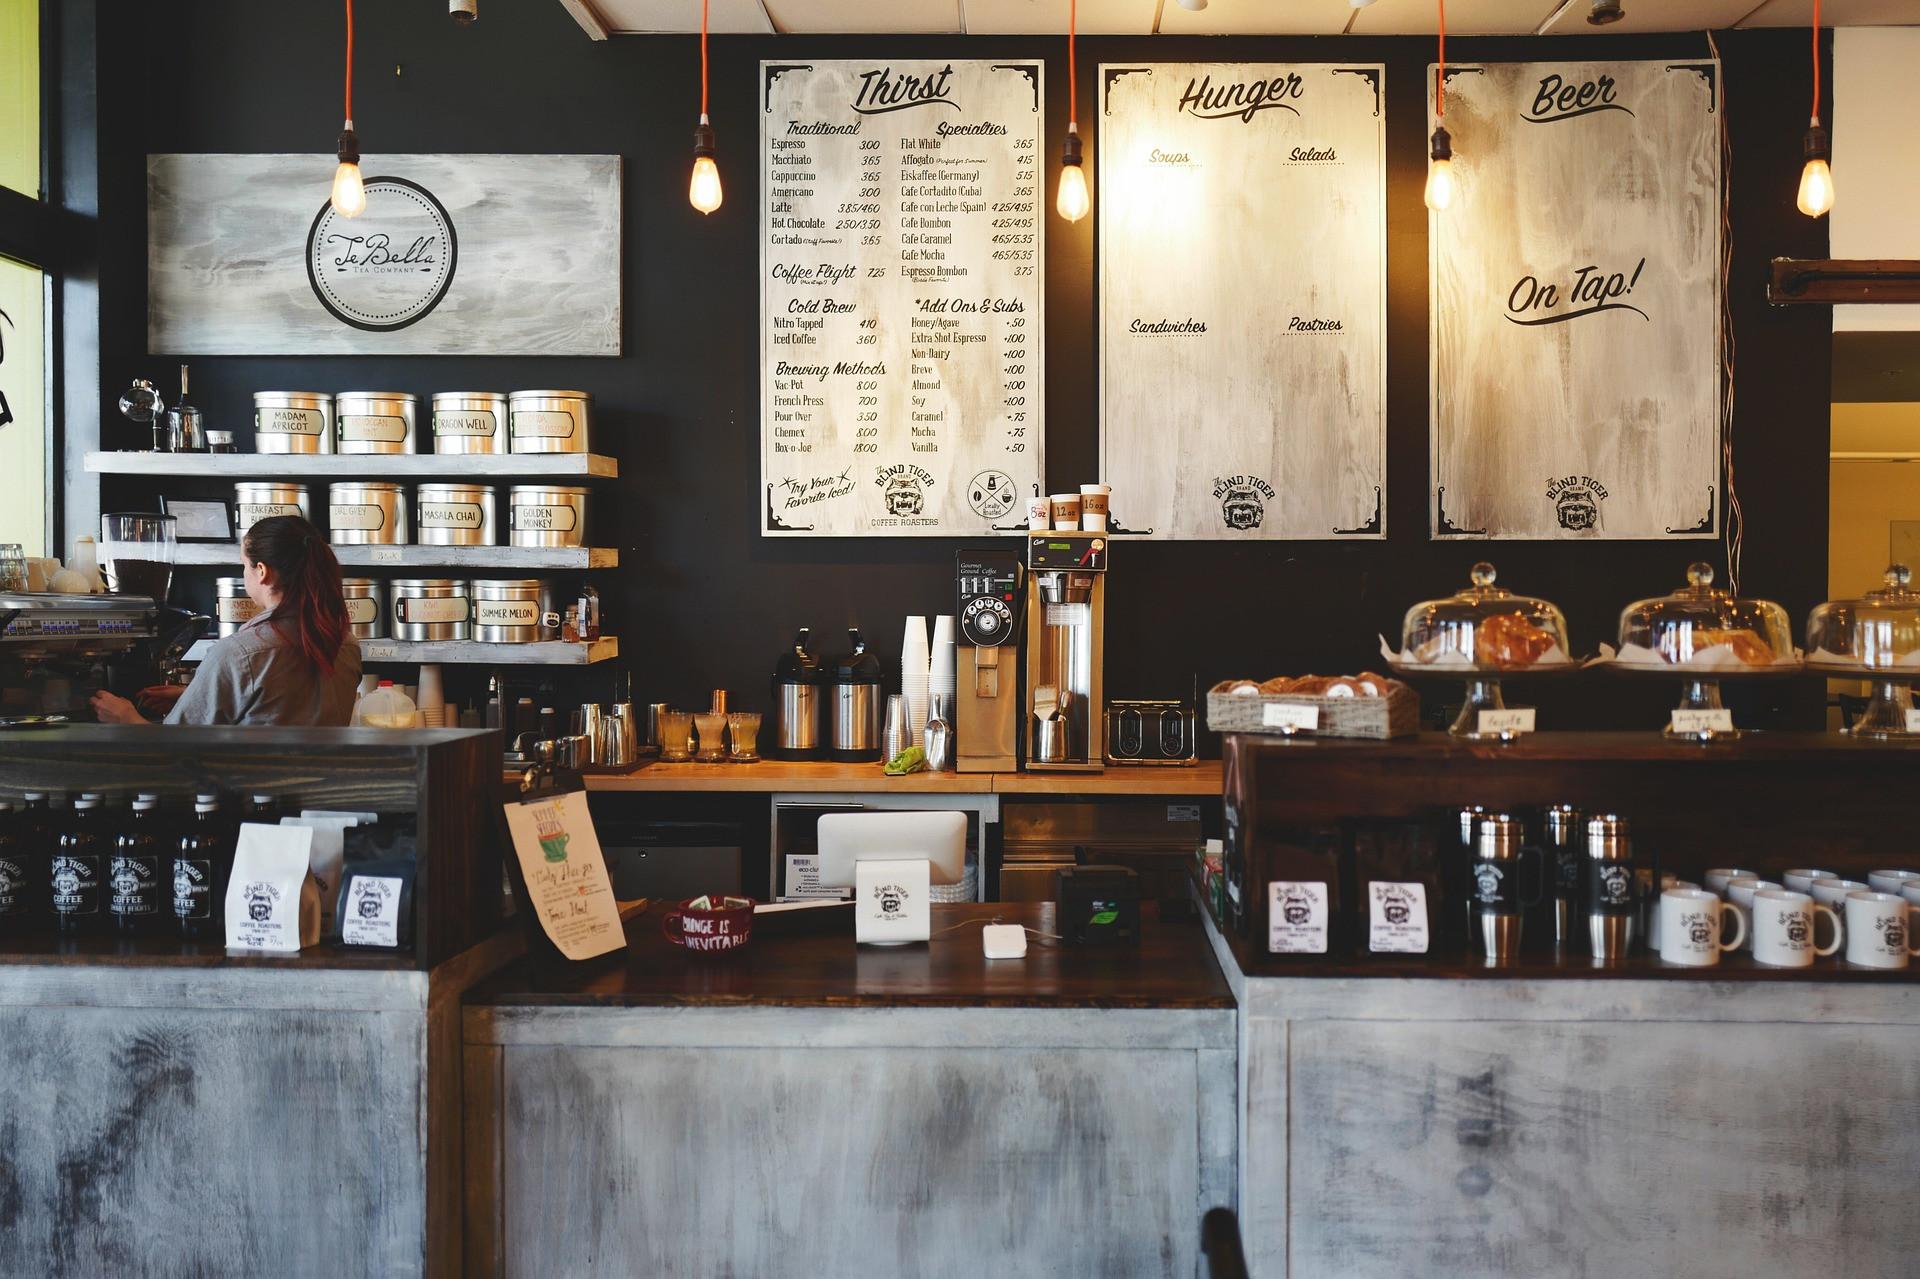 coffeehouse-StockSnapPixabay.jpg